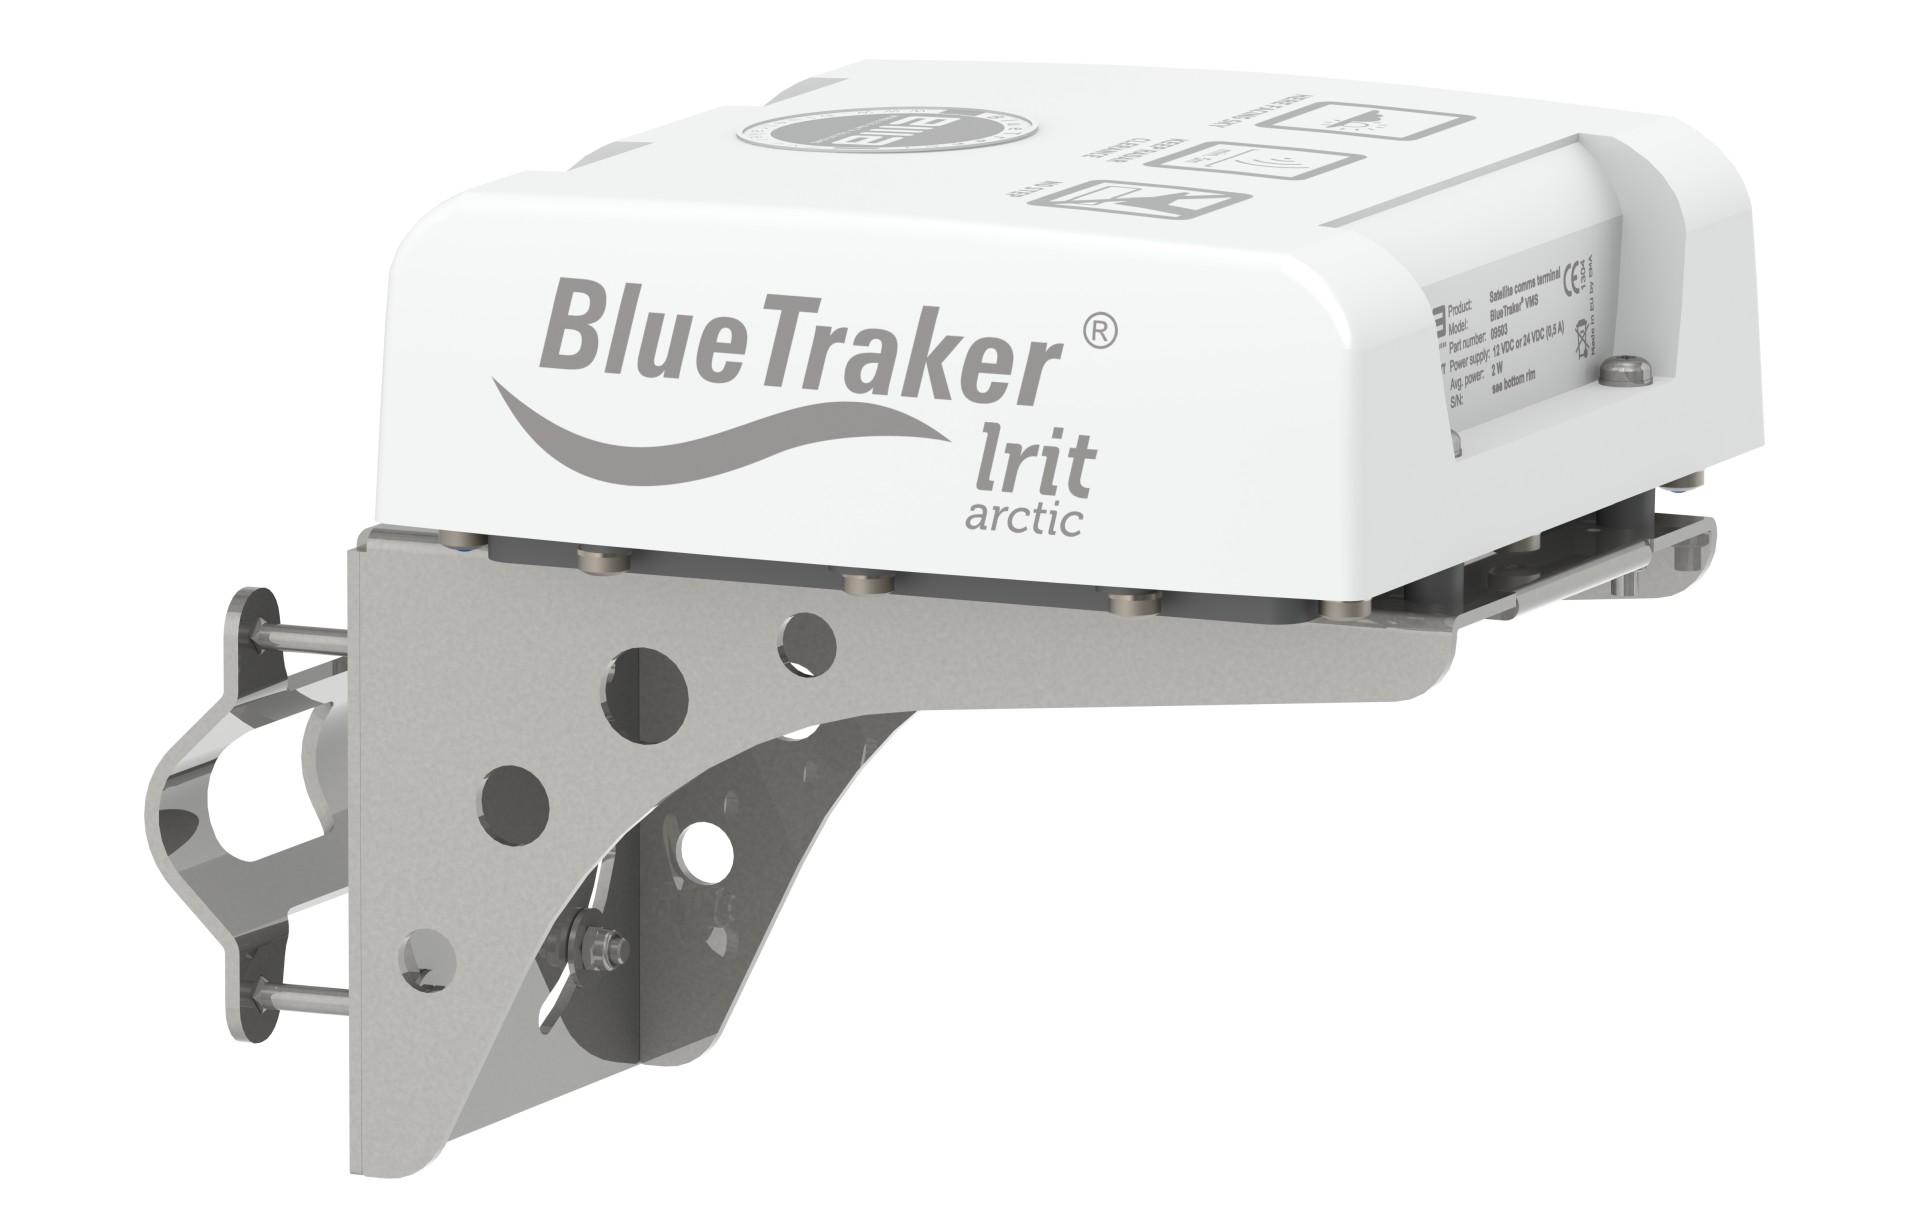 bluetracker lrit artic product image